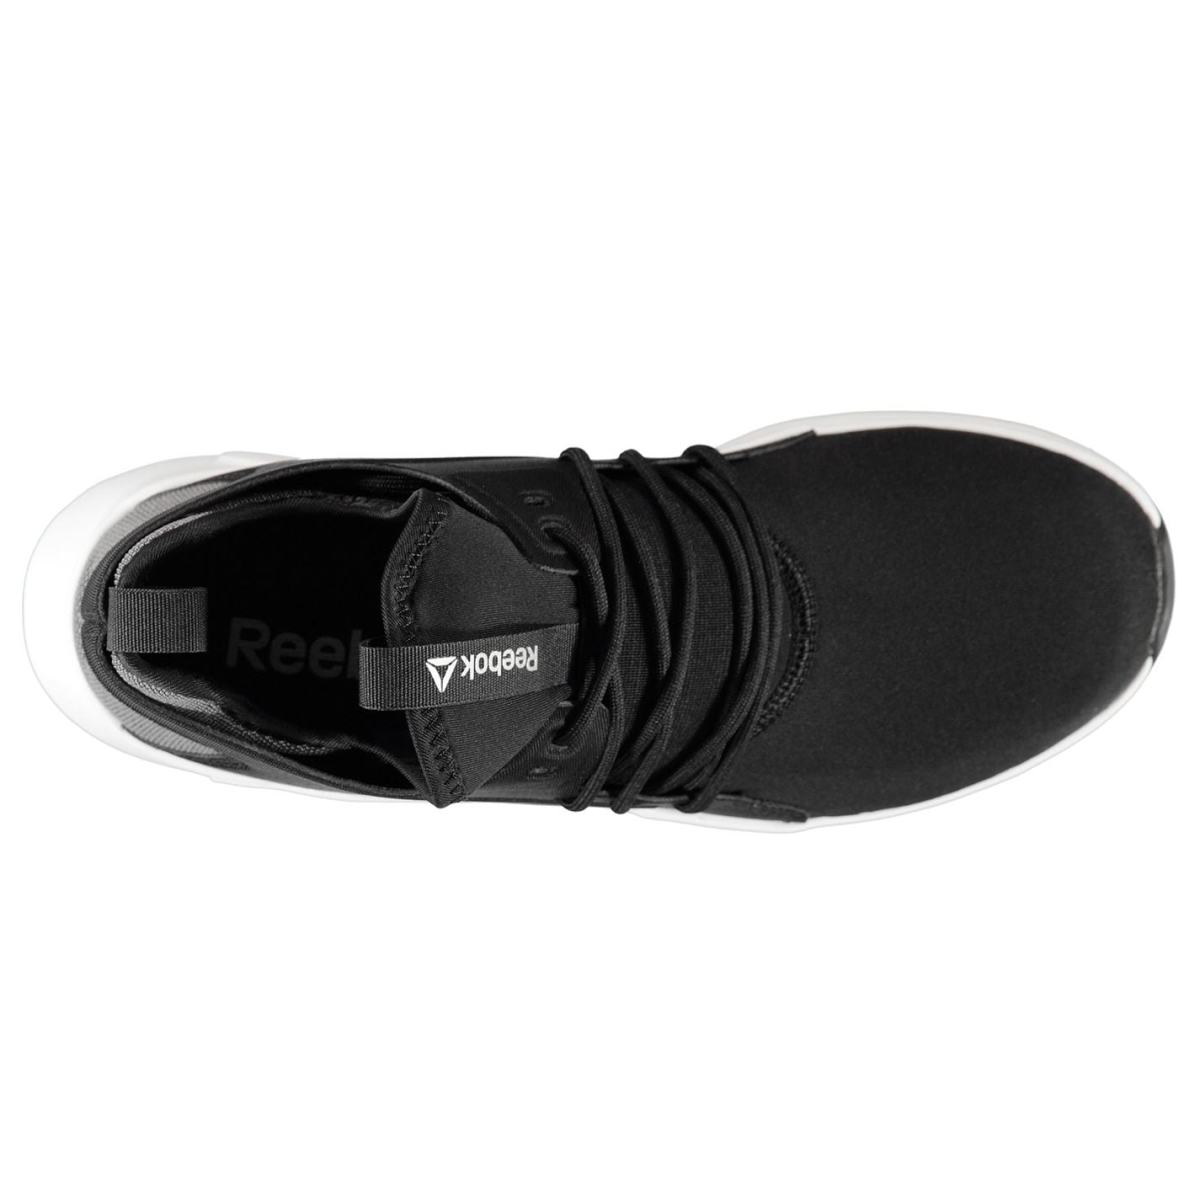 Reebok-Guresu-2-Turnschuhe-Laufschuhe-Damen-Sportschuhe-Sneaker-0163 Indexbild 4